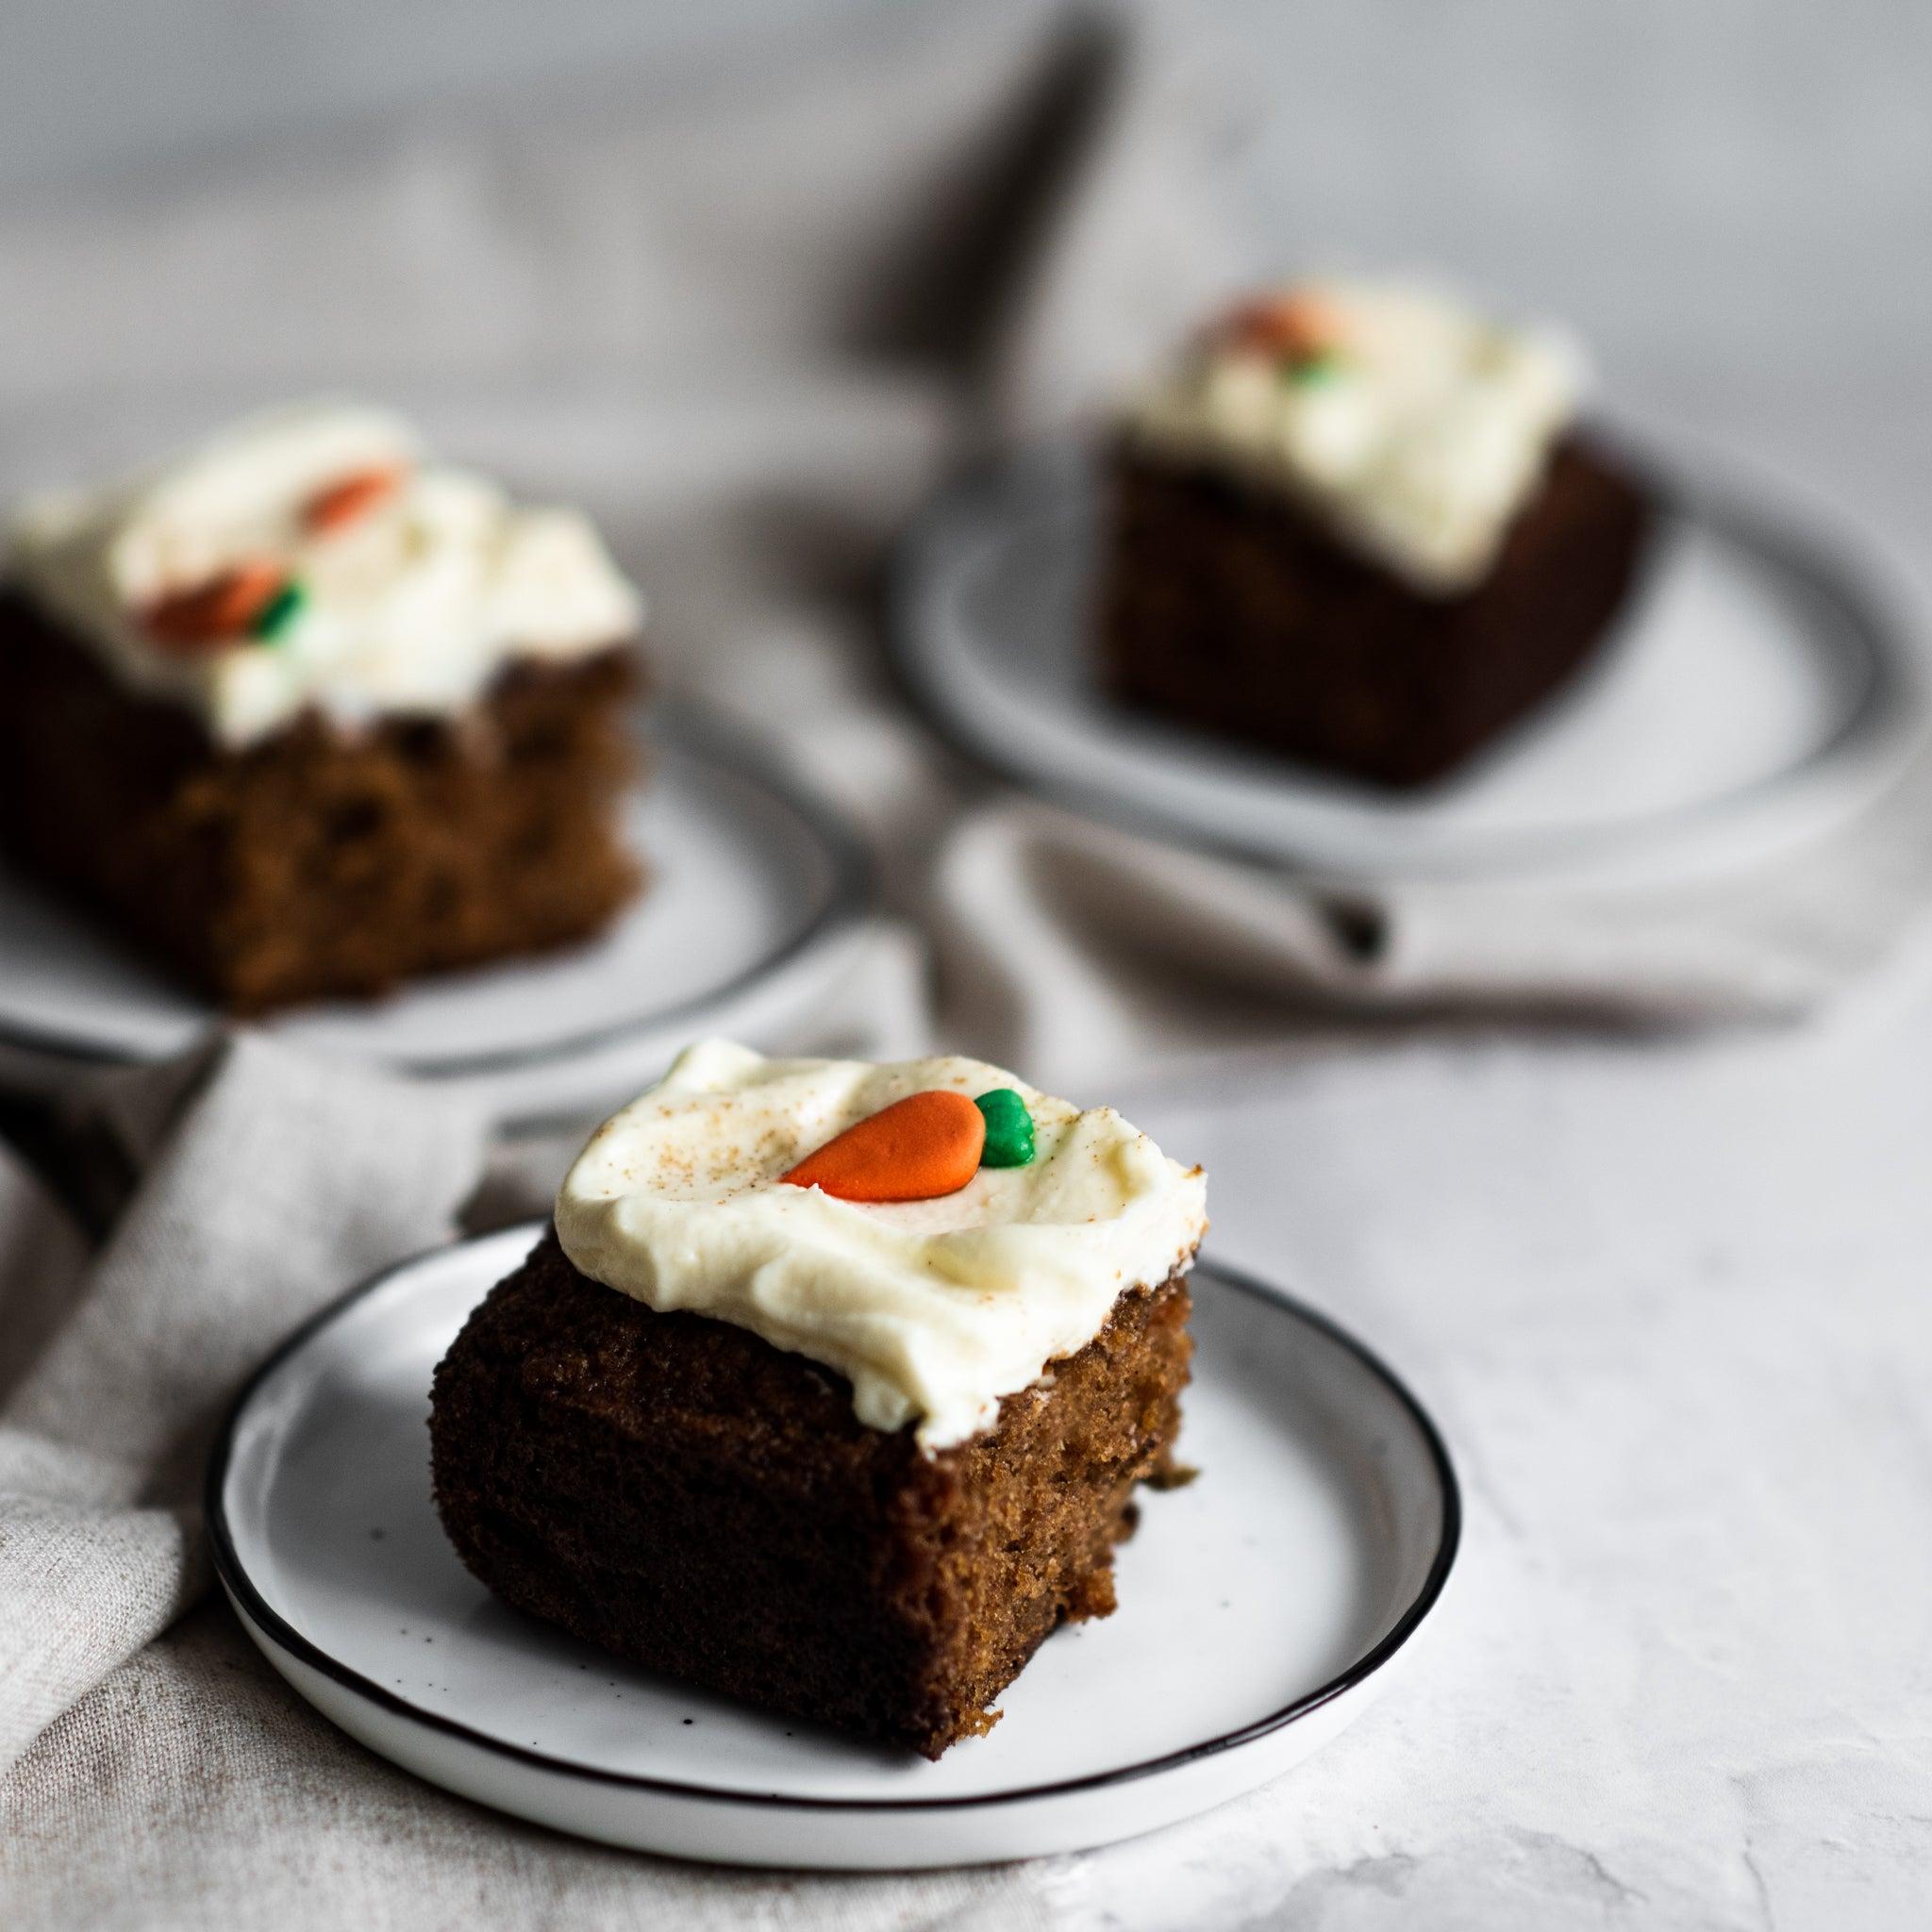 Carrot-Cake-Tray-Bake-SQUARE-8.jpg